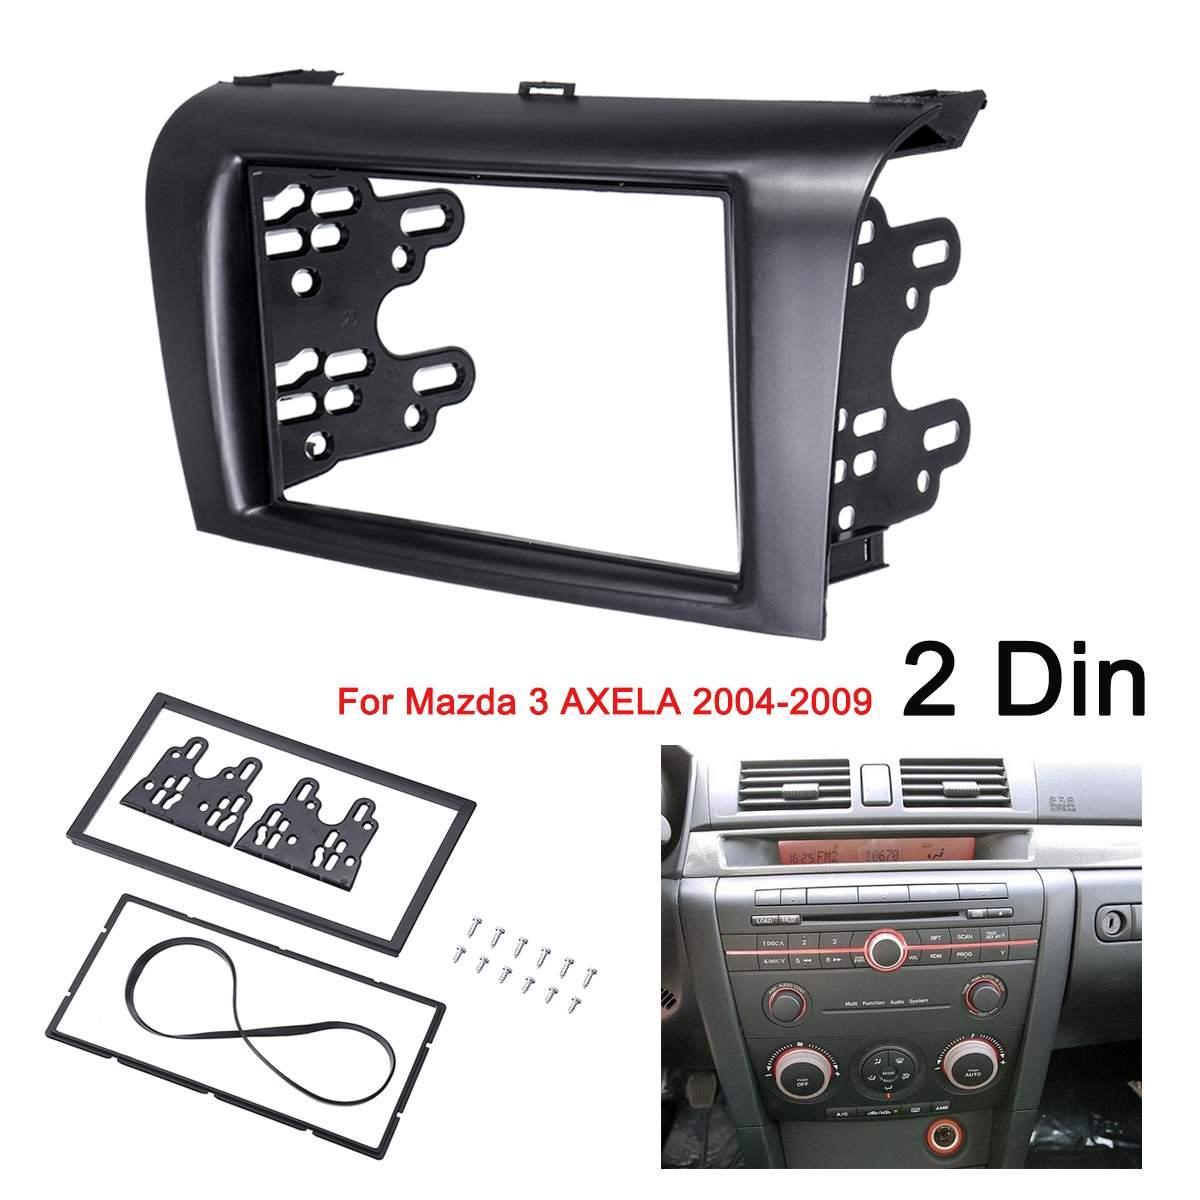 2DIN auto radio estéreo DVD Fascia PVC panel de salpicadero de kit de marco ajustable para Mazda 3 AXELA 2004, 2005, 2006, 2007, 2008, 2009